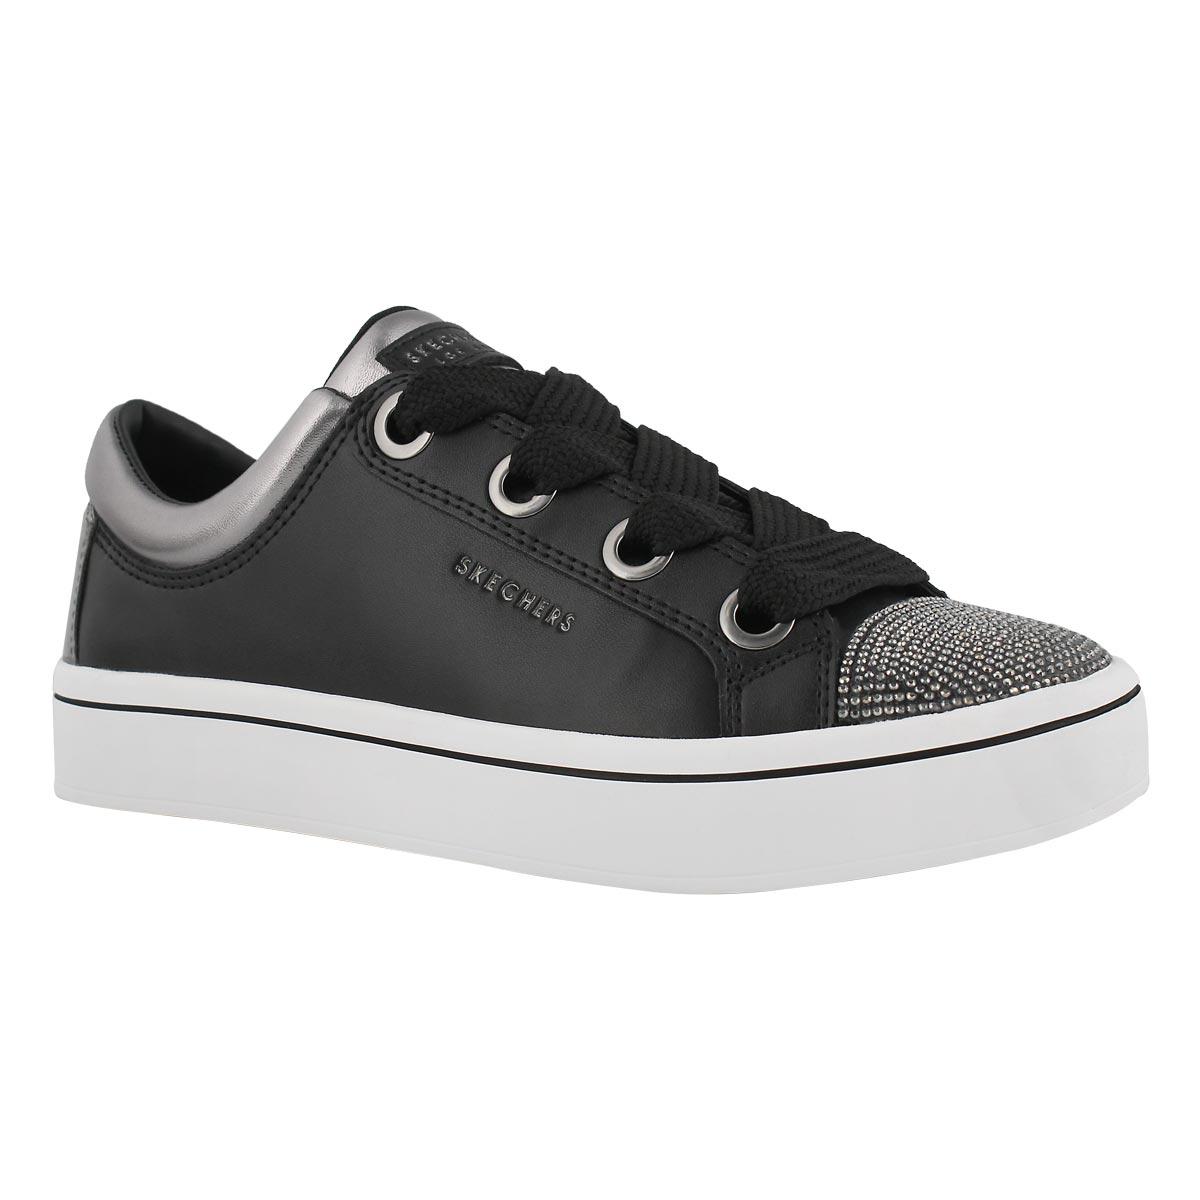 Women's HI-LITES black/pewter lace up sneakers